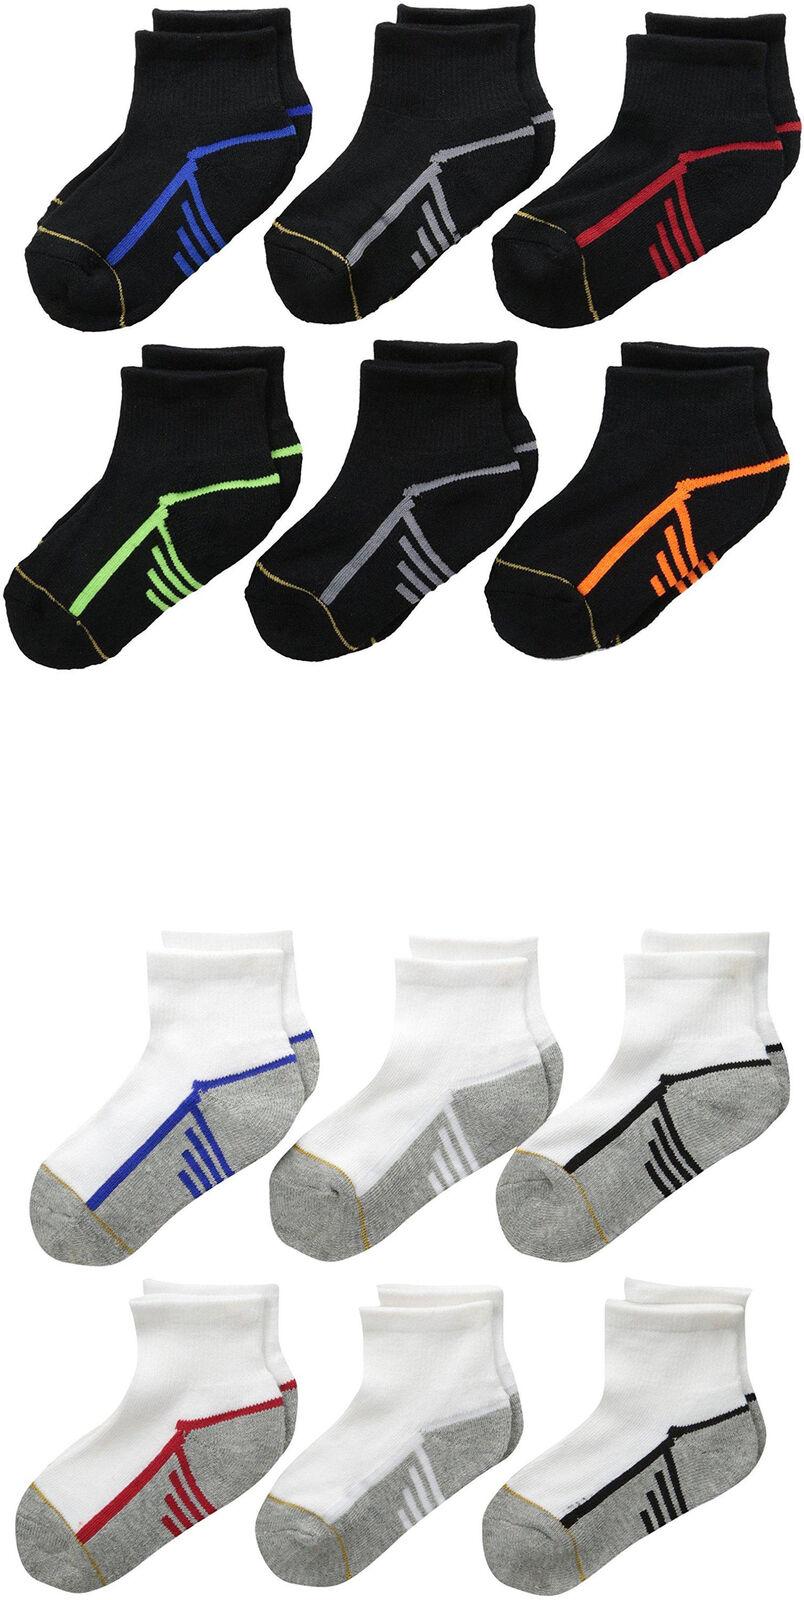 Gold Toe Big Boys' Athletic Quarter Socks, Assorted Colors, 6 Pairs | eBay